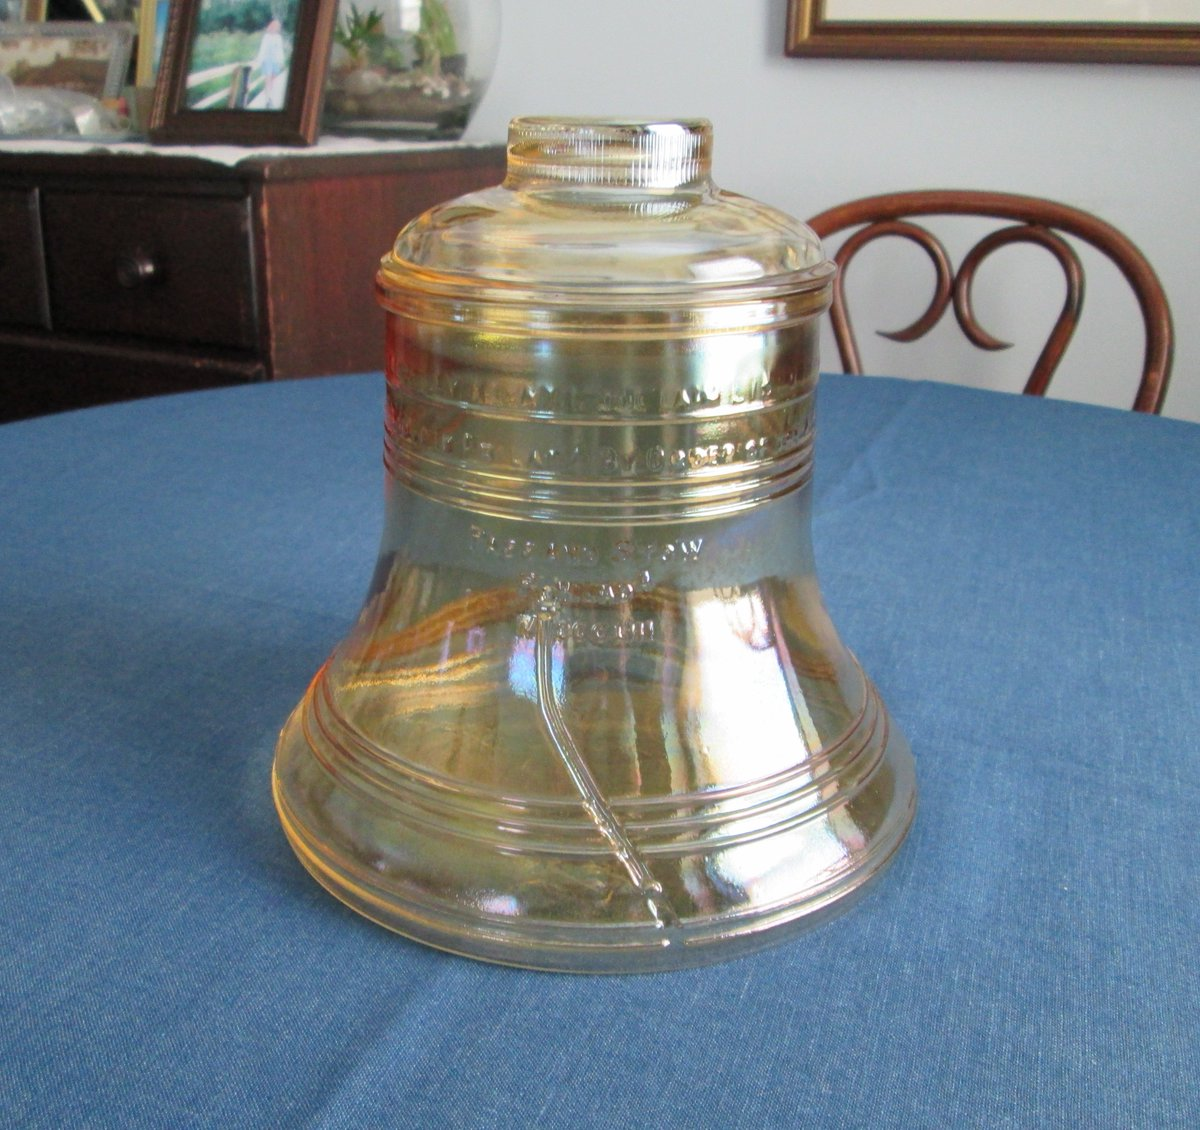 Vintage 1976 Liberty Bell Bicentennial Glass Cookie Jar #vintage #kitchen  http:// etsy.me/2yuO9Te  &nbsp;   via @Etsy<br>http://pic.twitter.com/HZeQbhUtfi